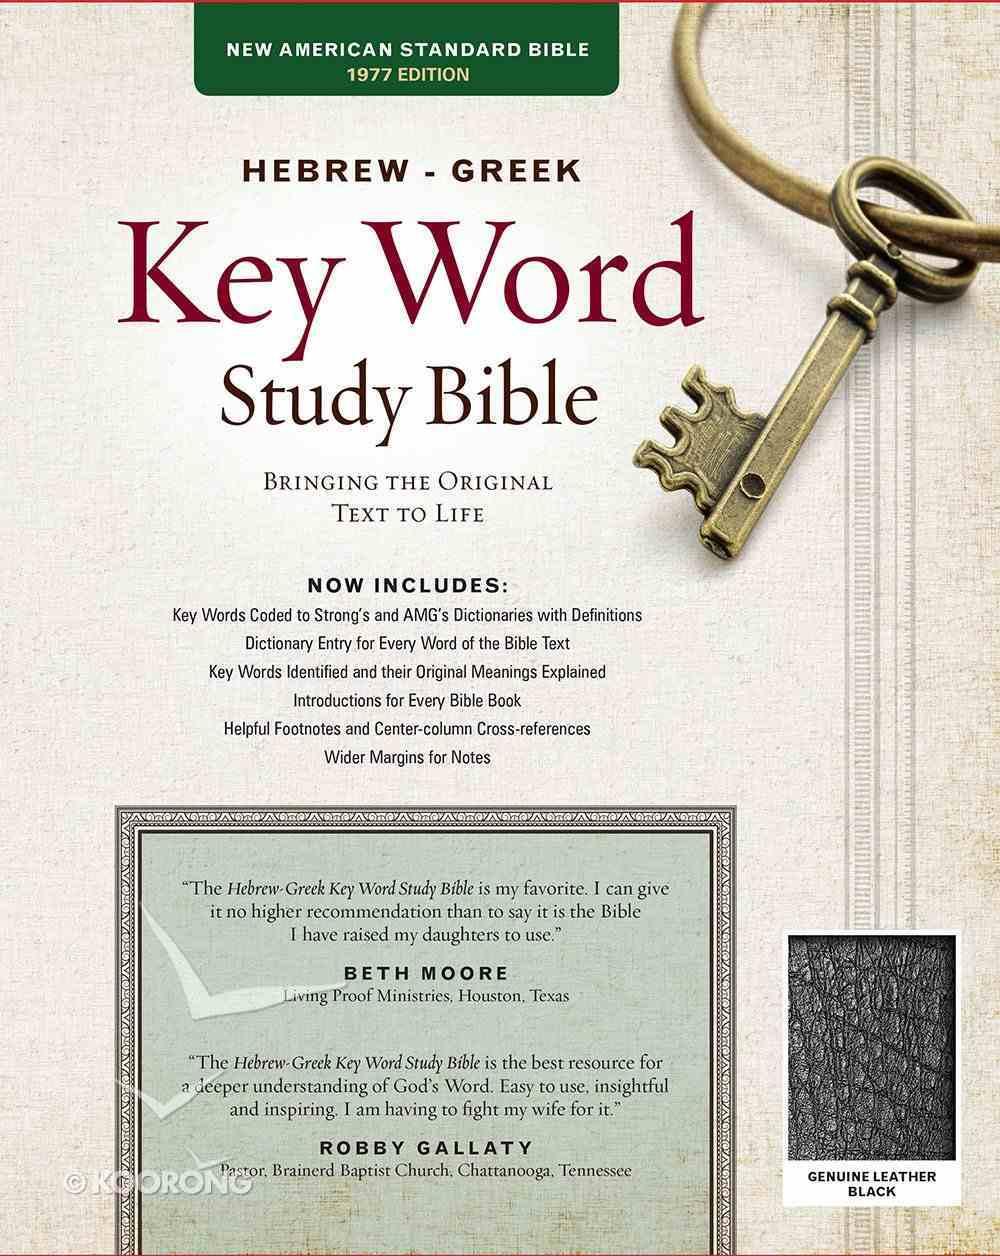 NASB Hebrew-Greek Key Word Study Bible Black (New Edition) Genuine Leather